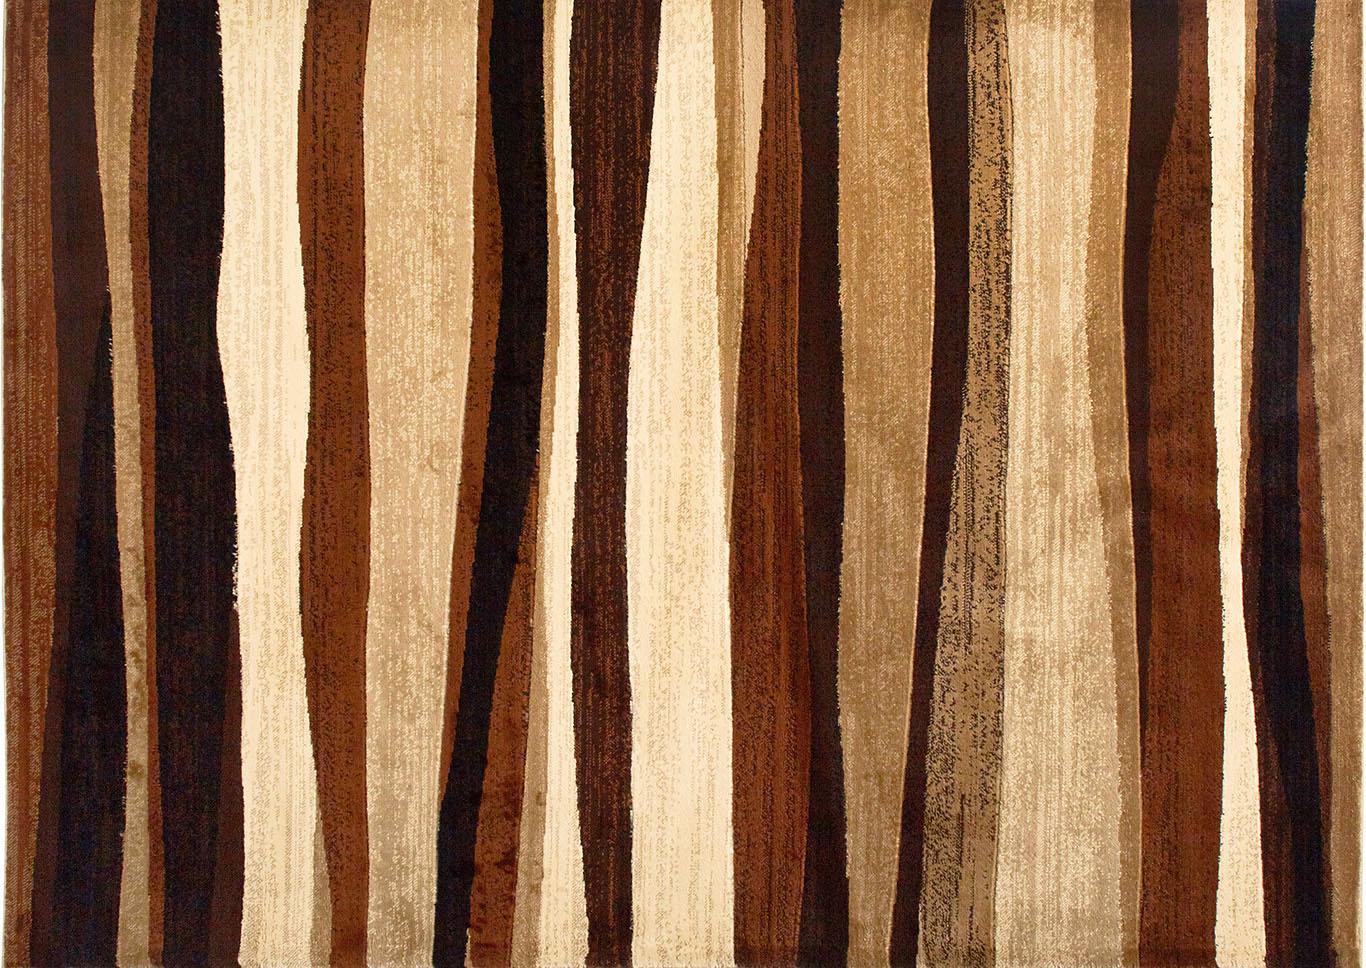 Home Dynamix Tribeca Jayden Contemporary Area Rug 39 X55 Striped Brown Beige Black Renaissance Philadelphia Pa